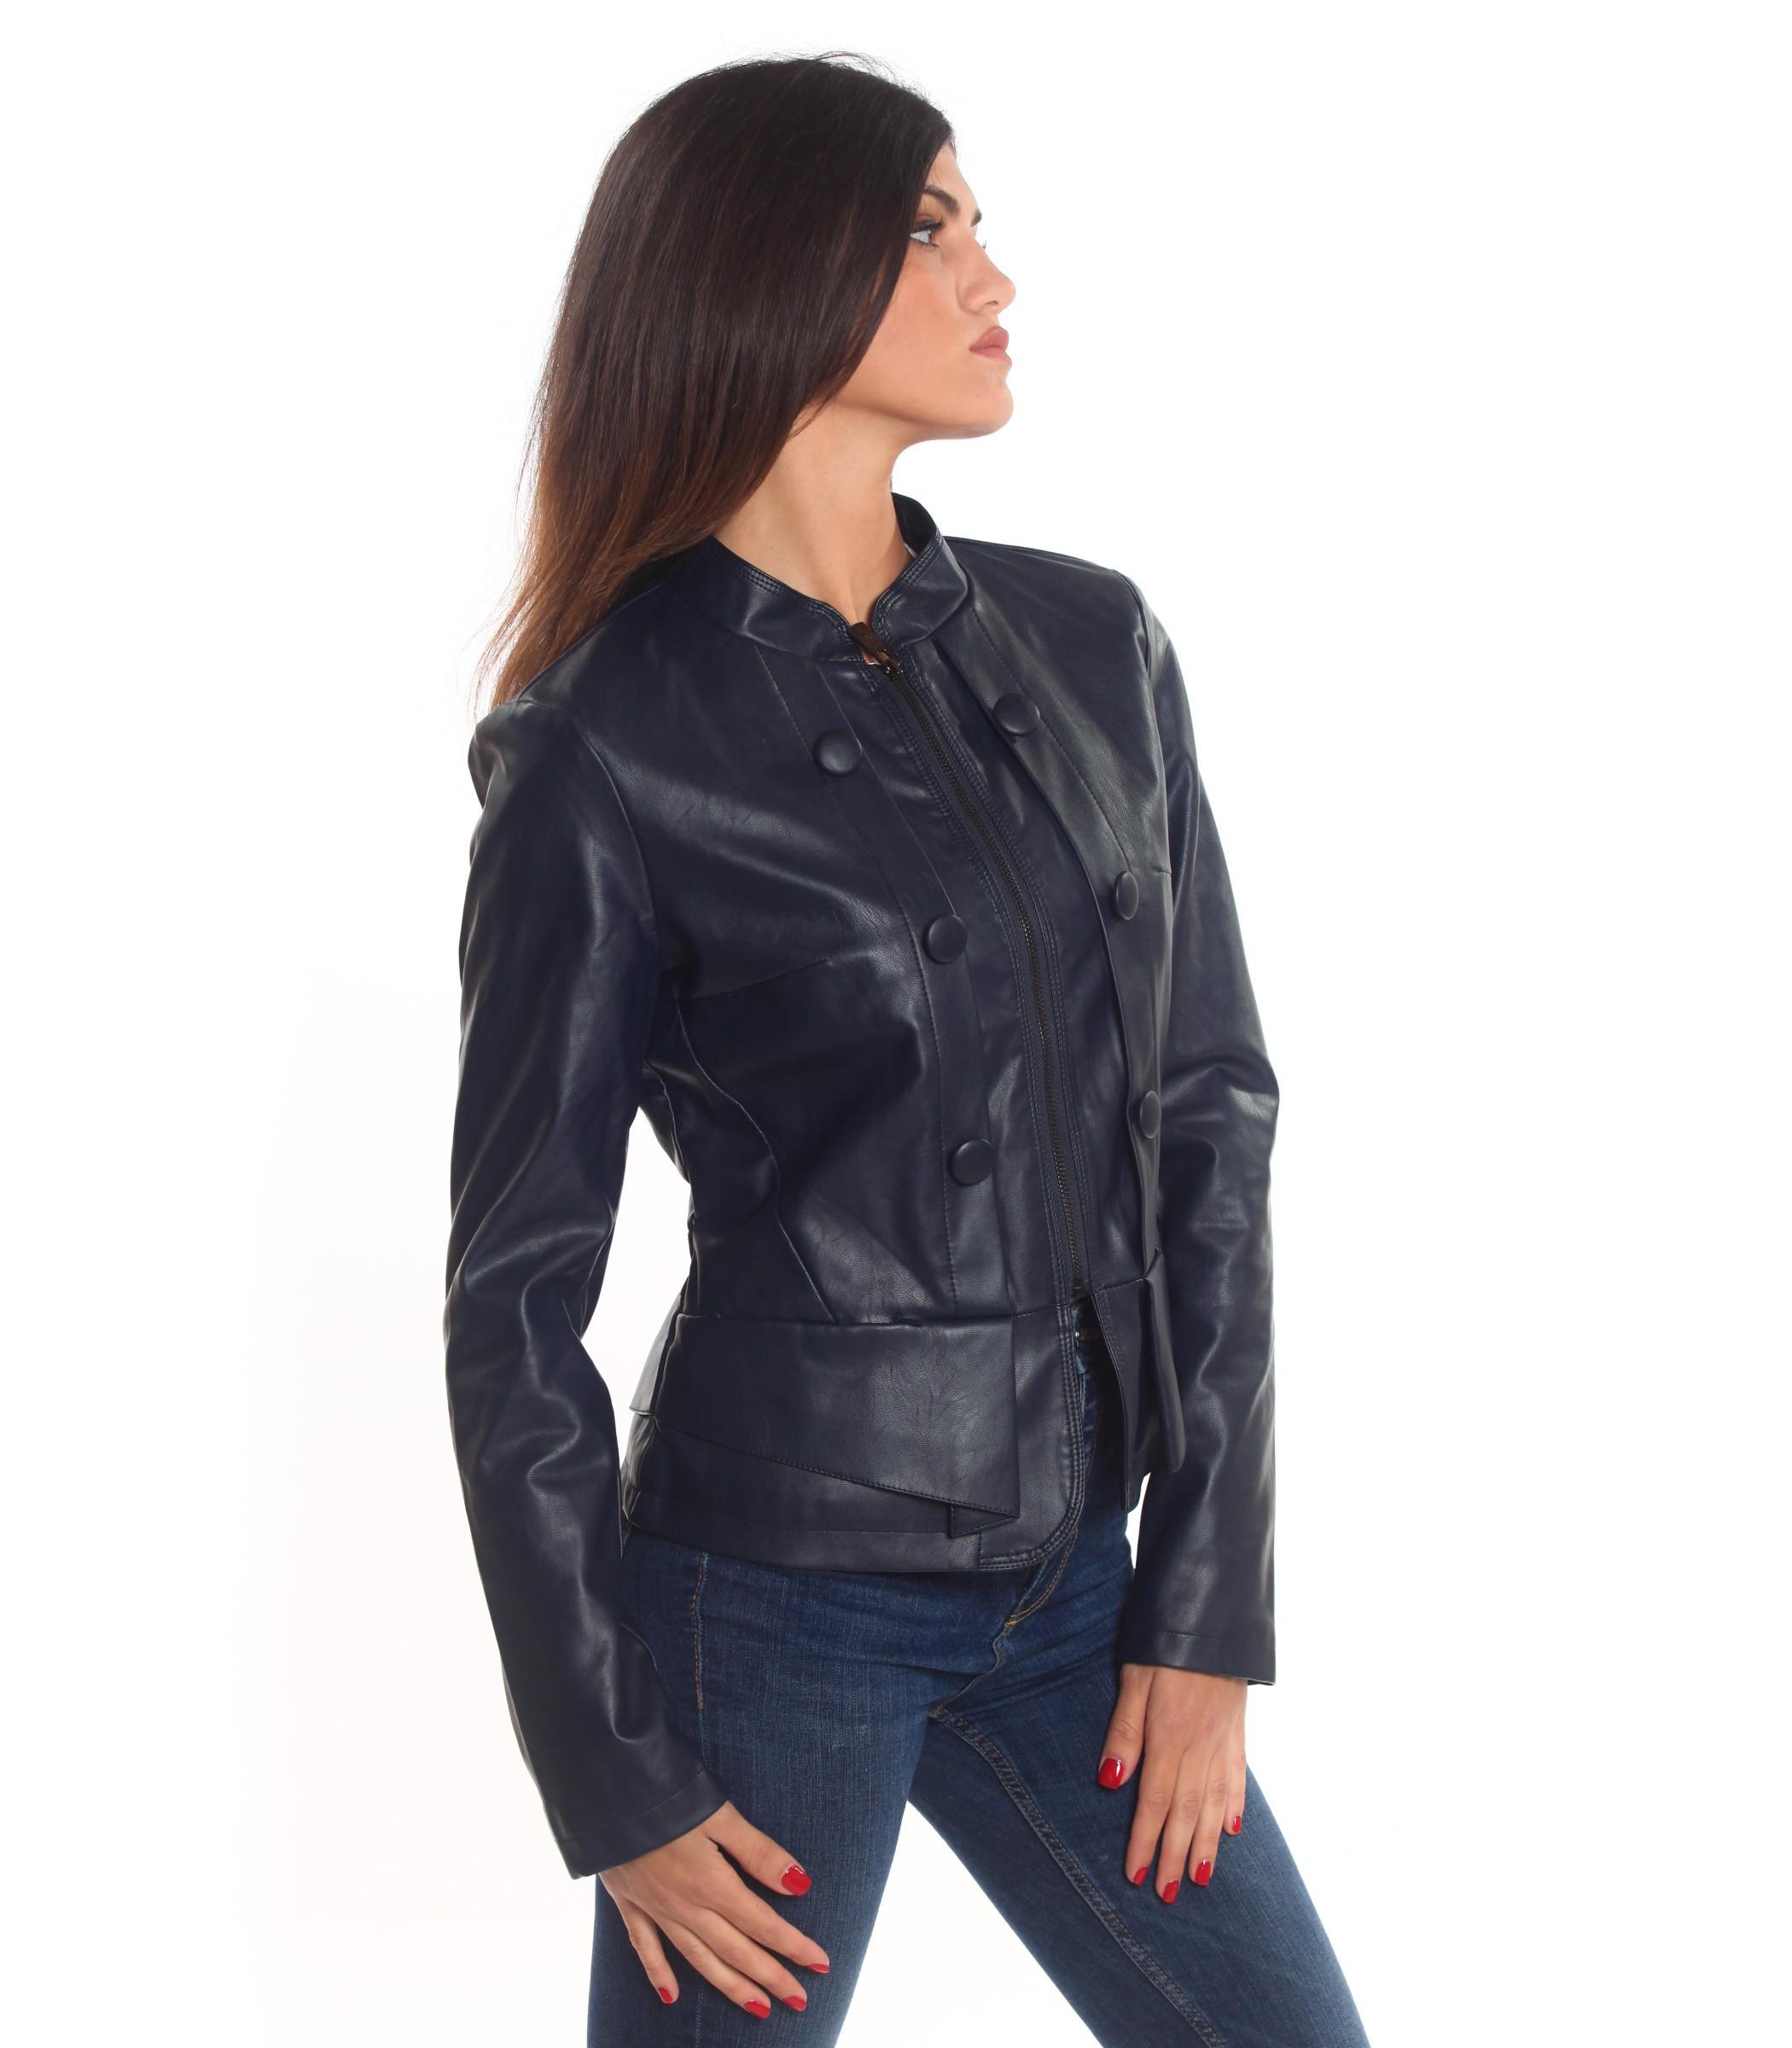 online retailer 6f335 a4434 Giubbotto Giubbino Giacca Yes Zee in eco pelle da donna rif ...